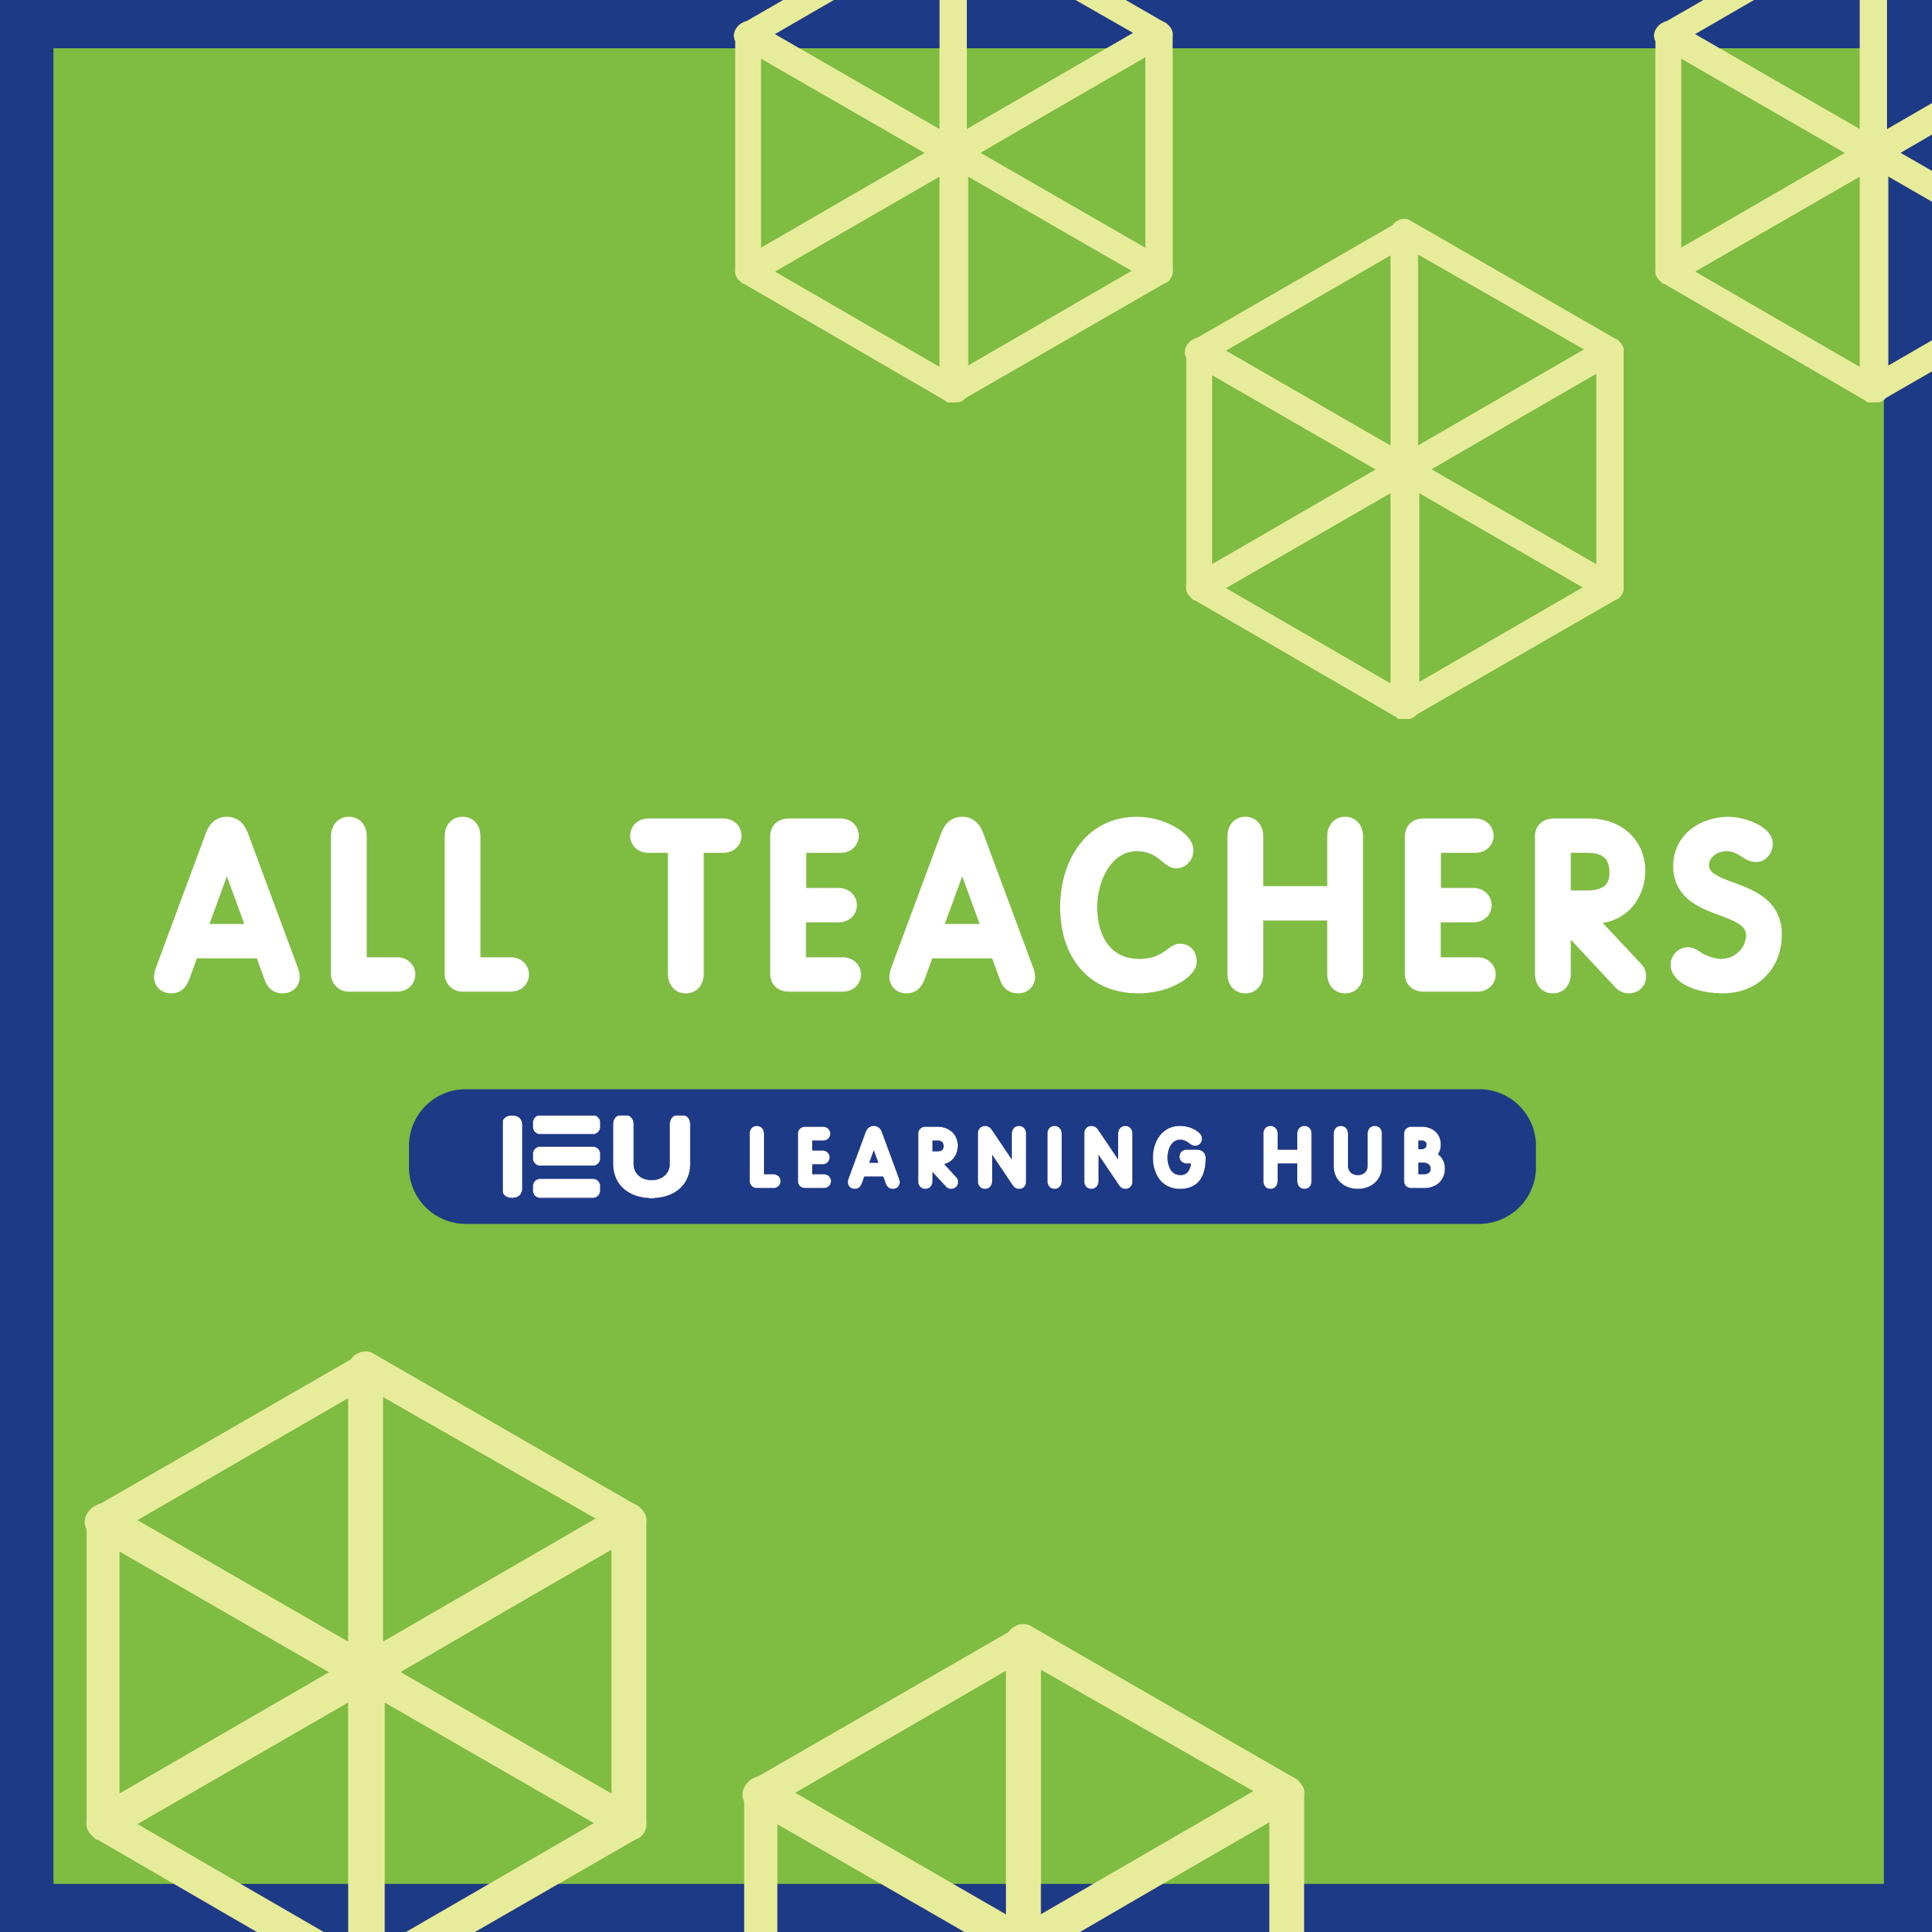 All Teachers